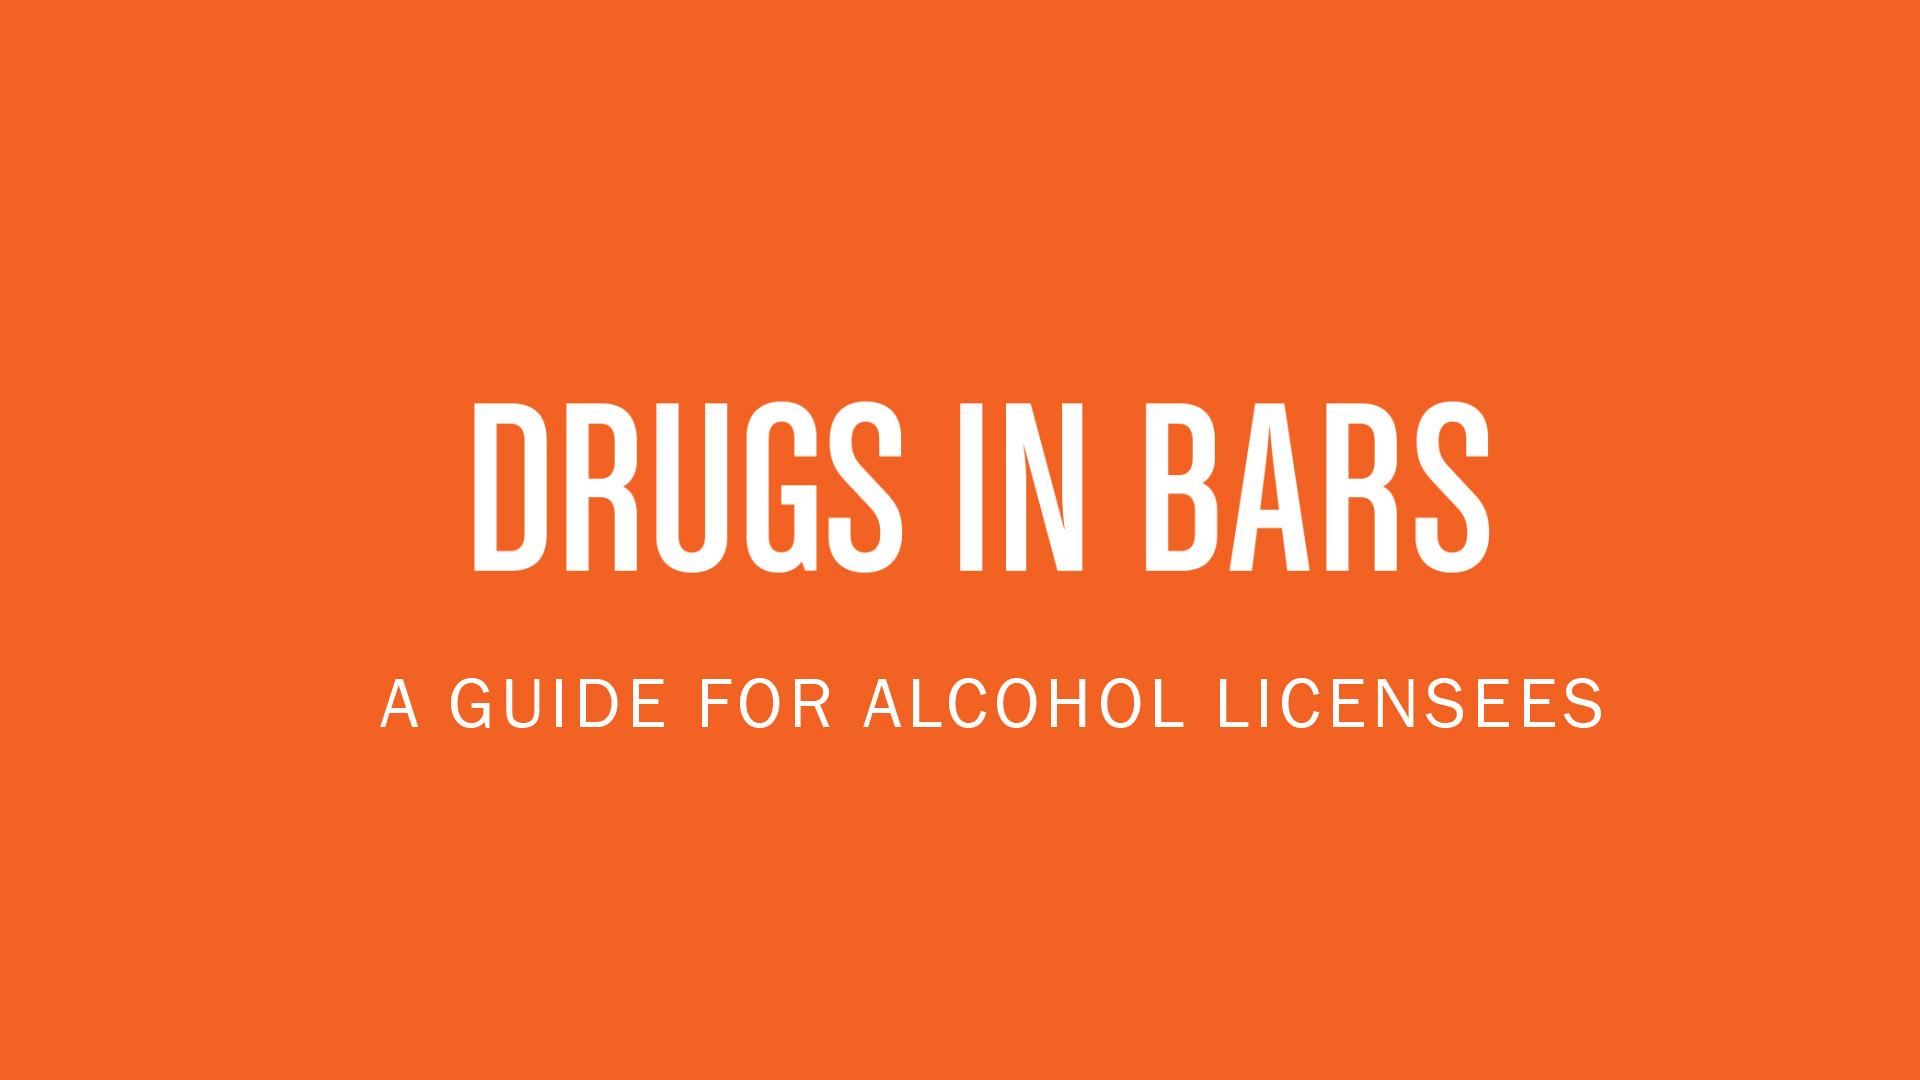 Drugs in Bars - Storyboard 02